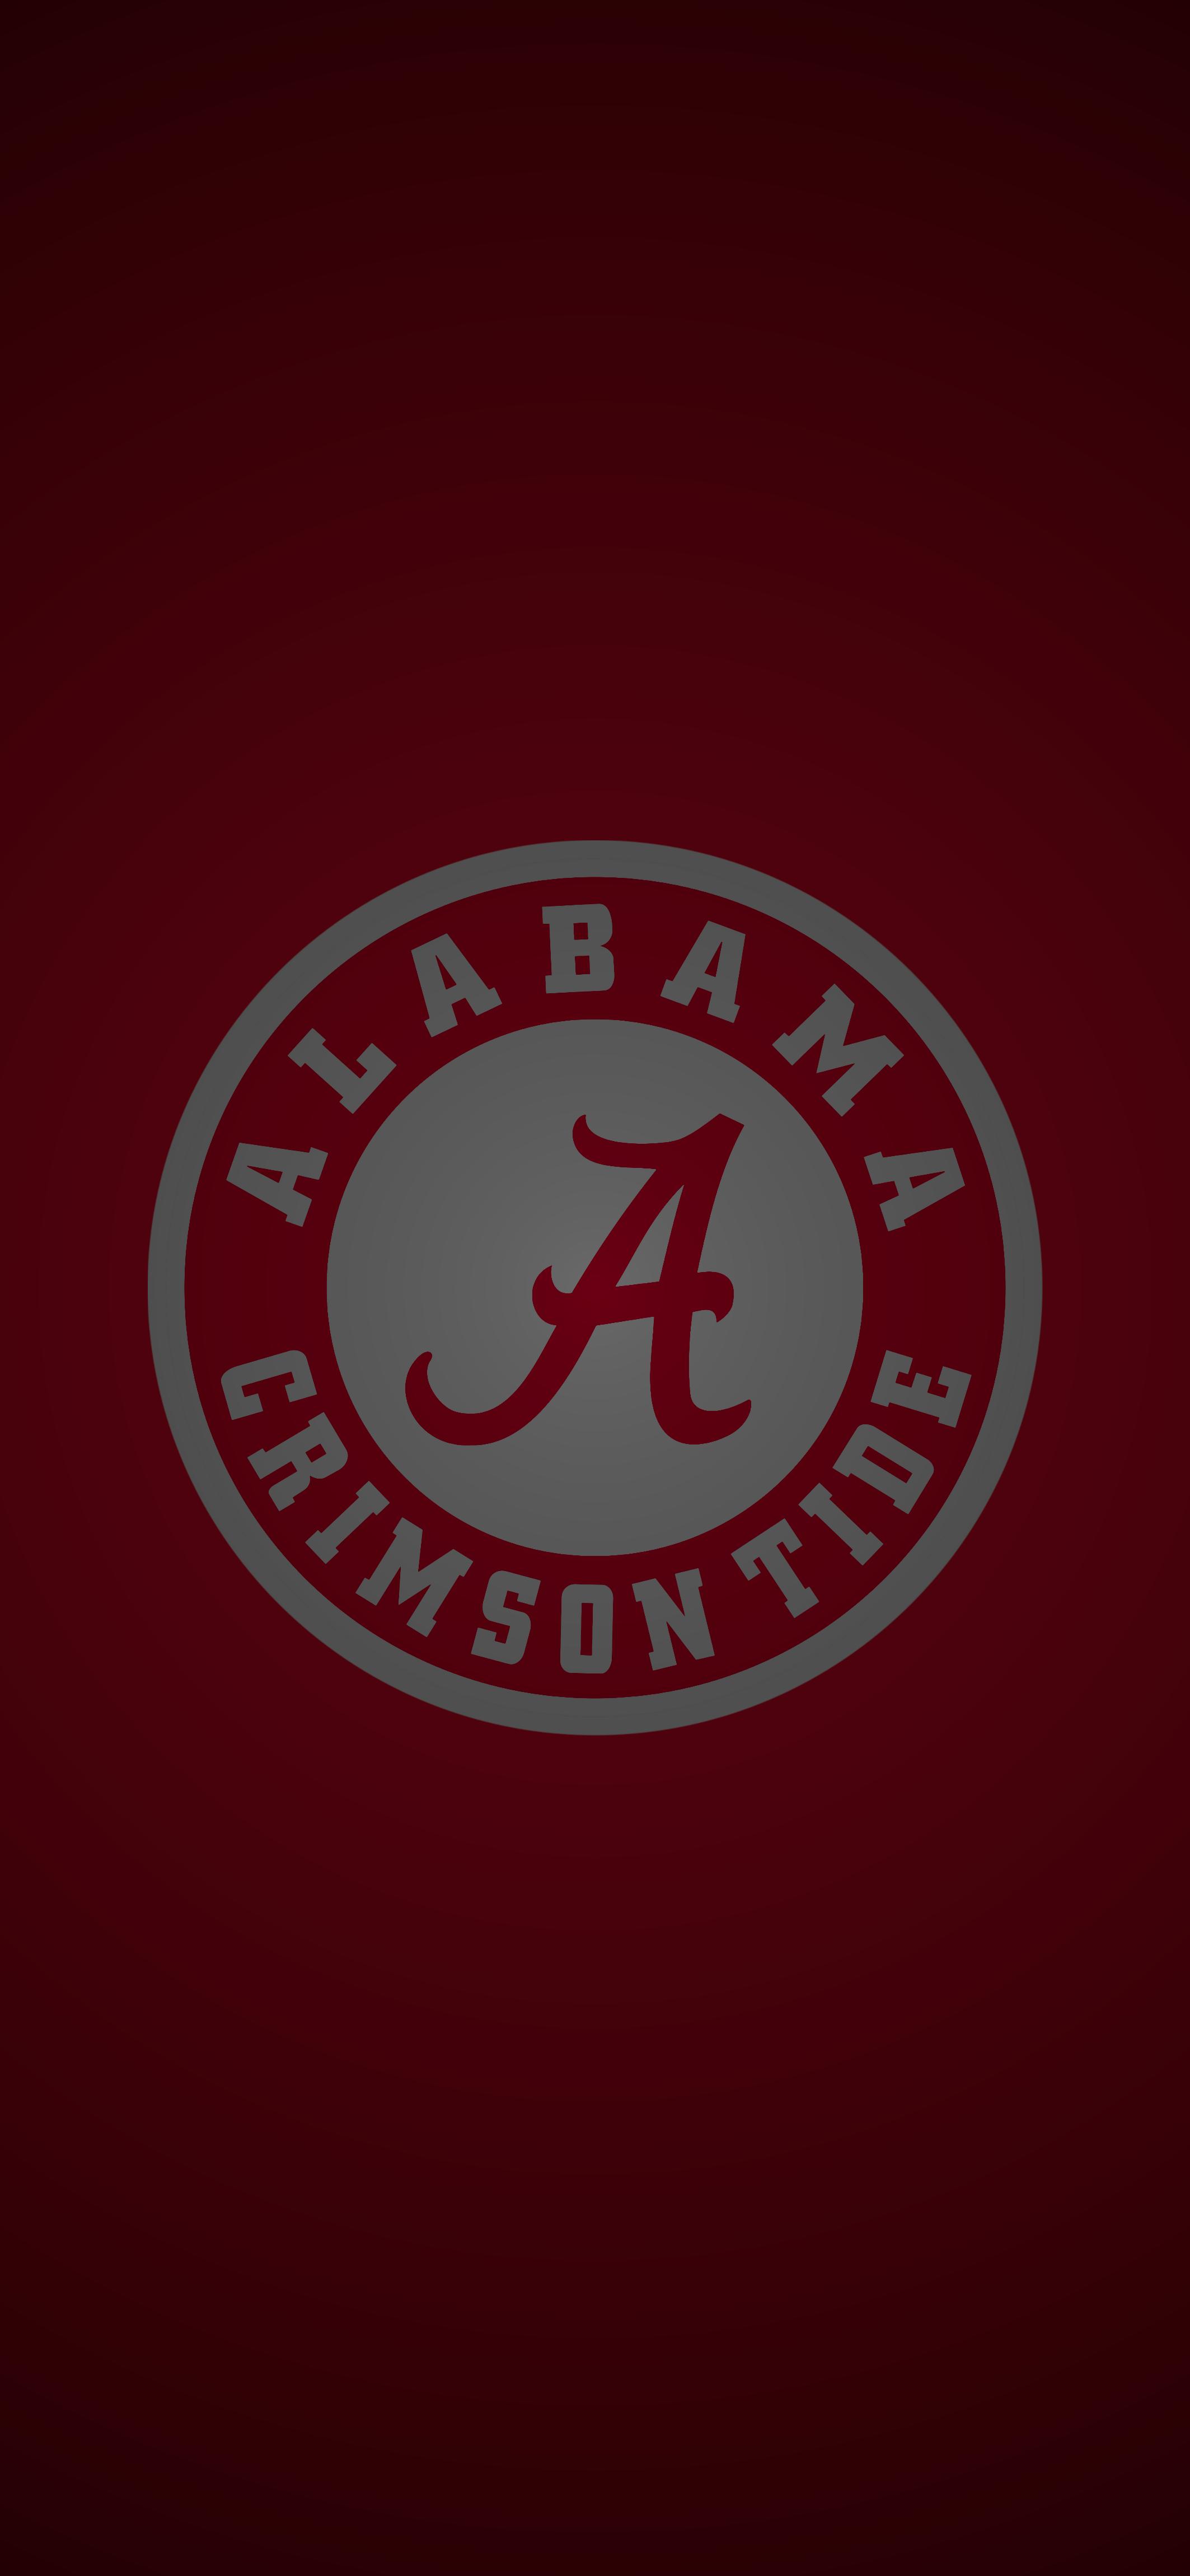 Alabama Crimson Tide Football Logo Iphone Wallpaper Alabama